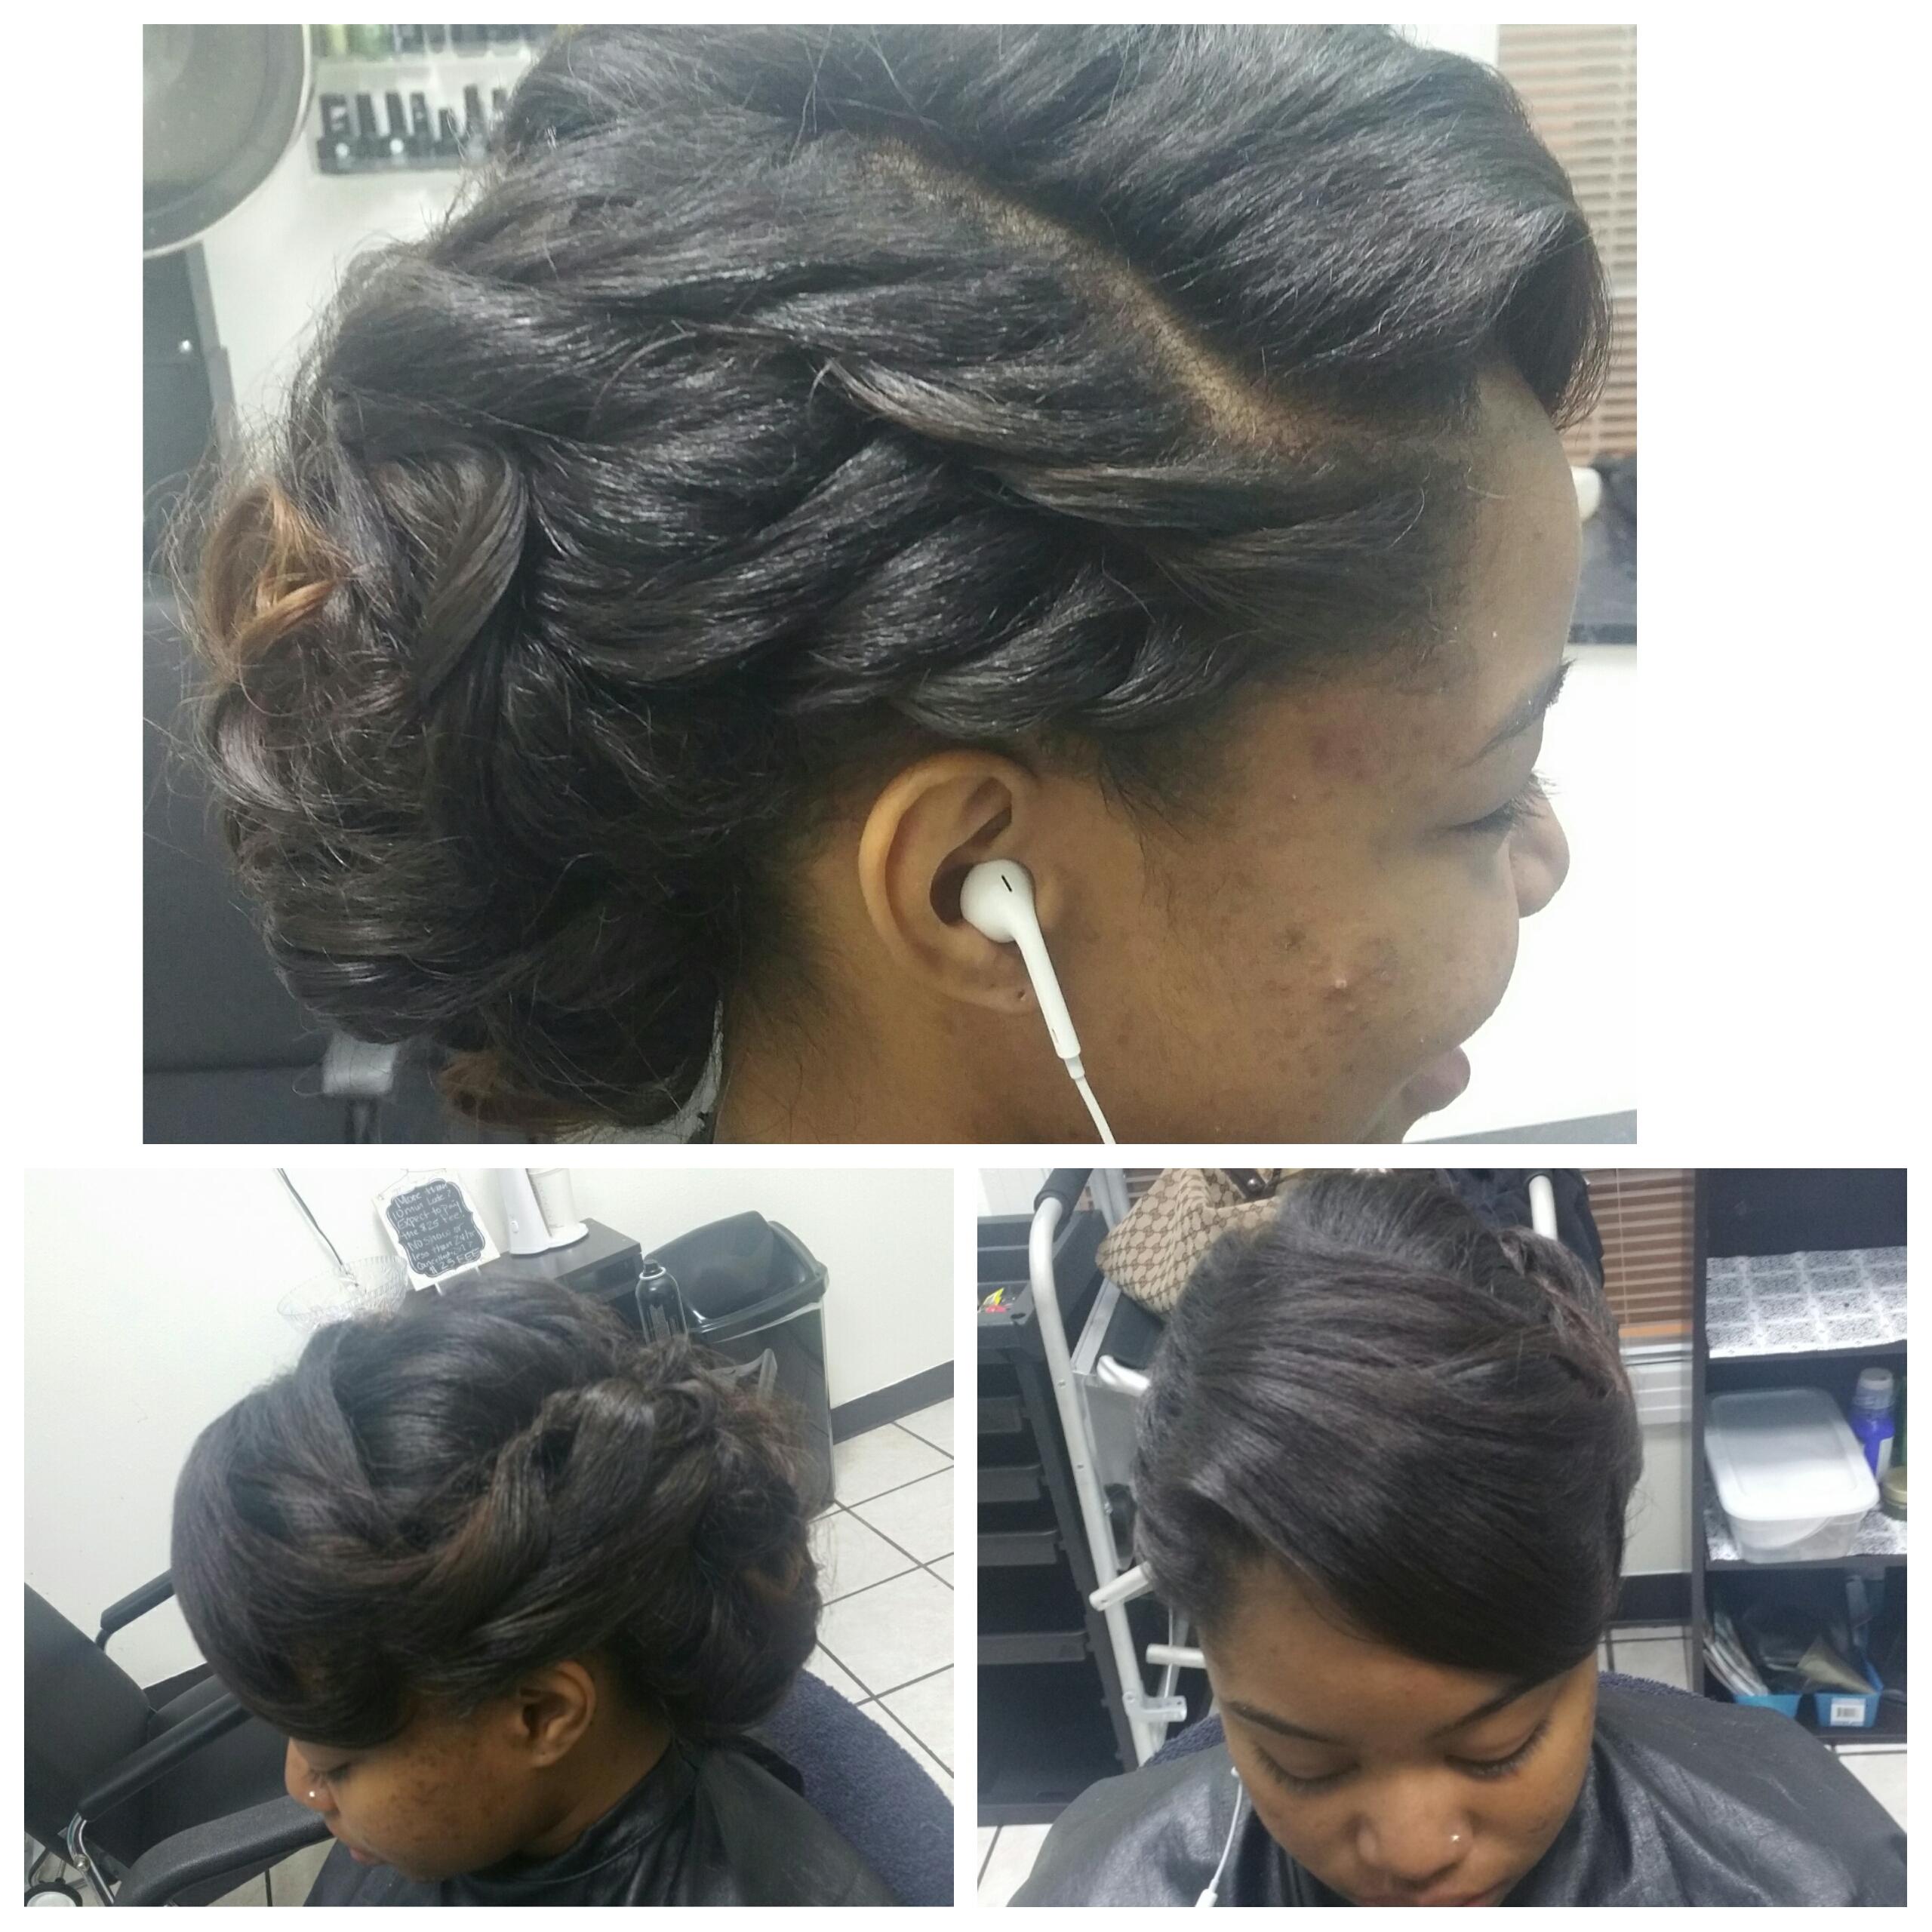 Braidless Sew-In w/ Updo